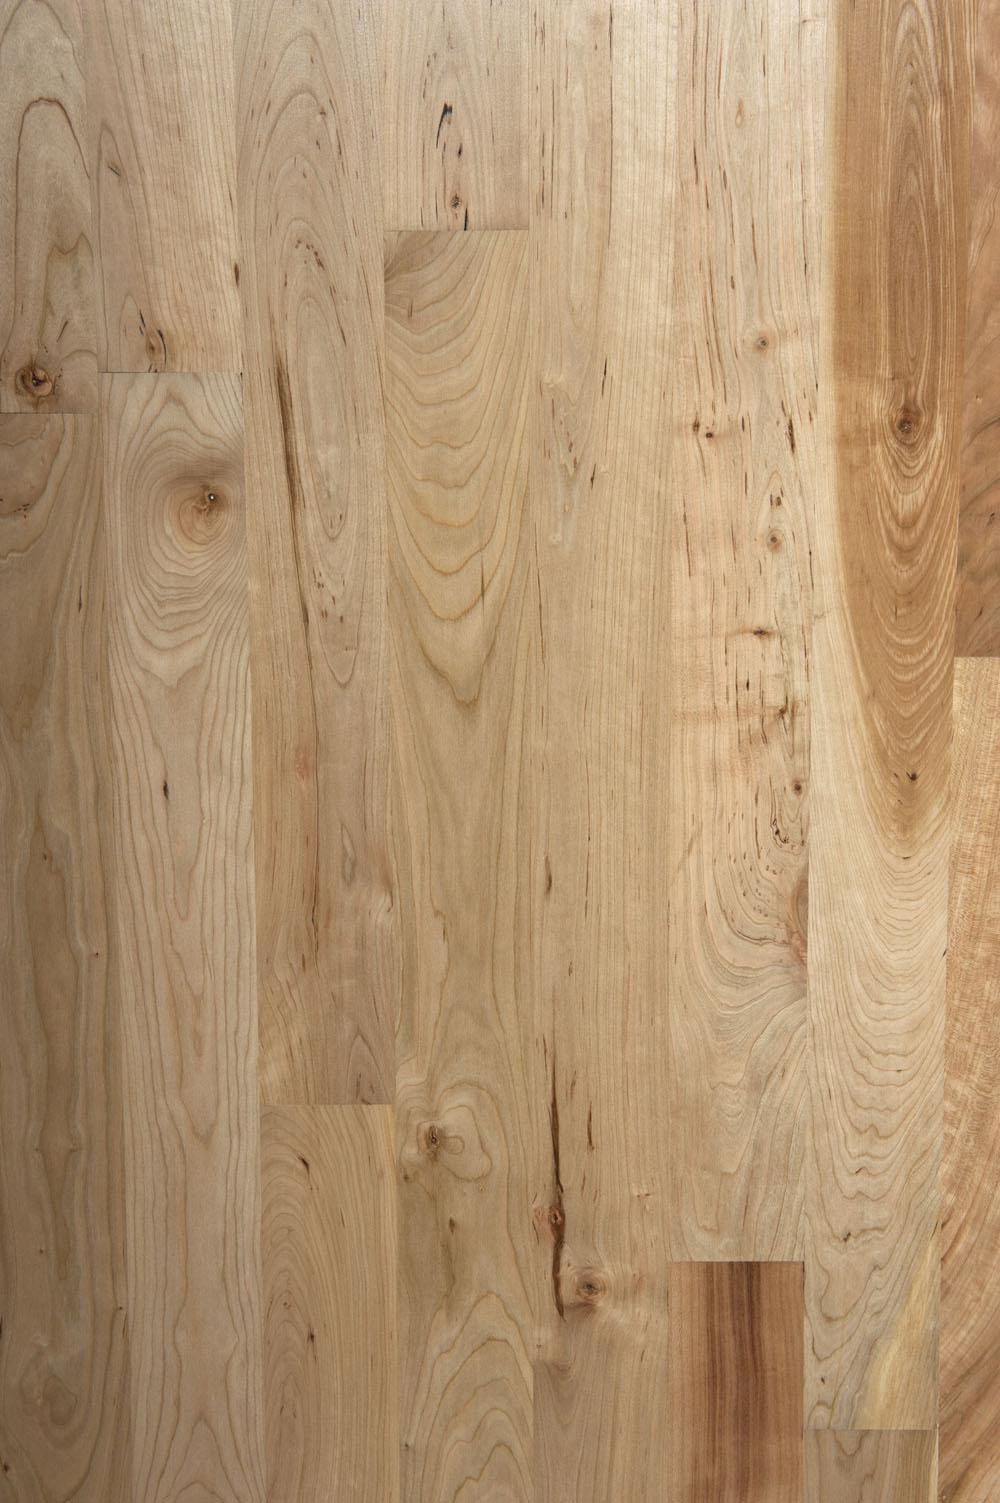 Unfinished American Cherry Boardwalk Hardwood Floors